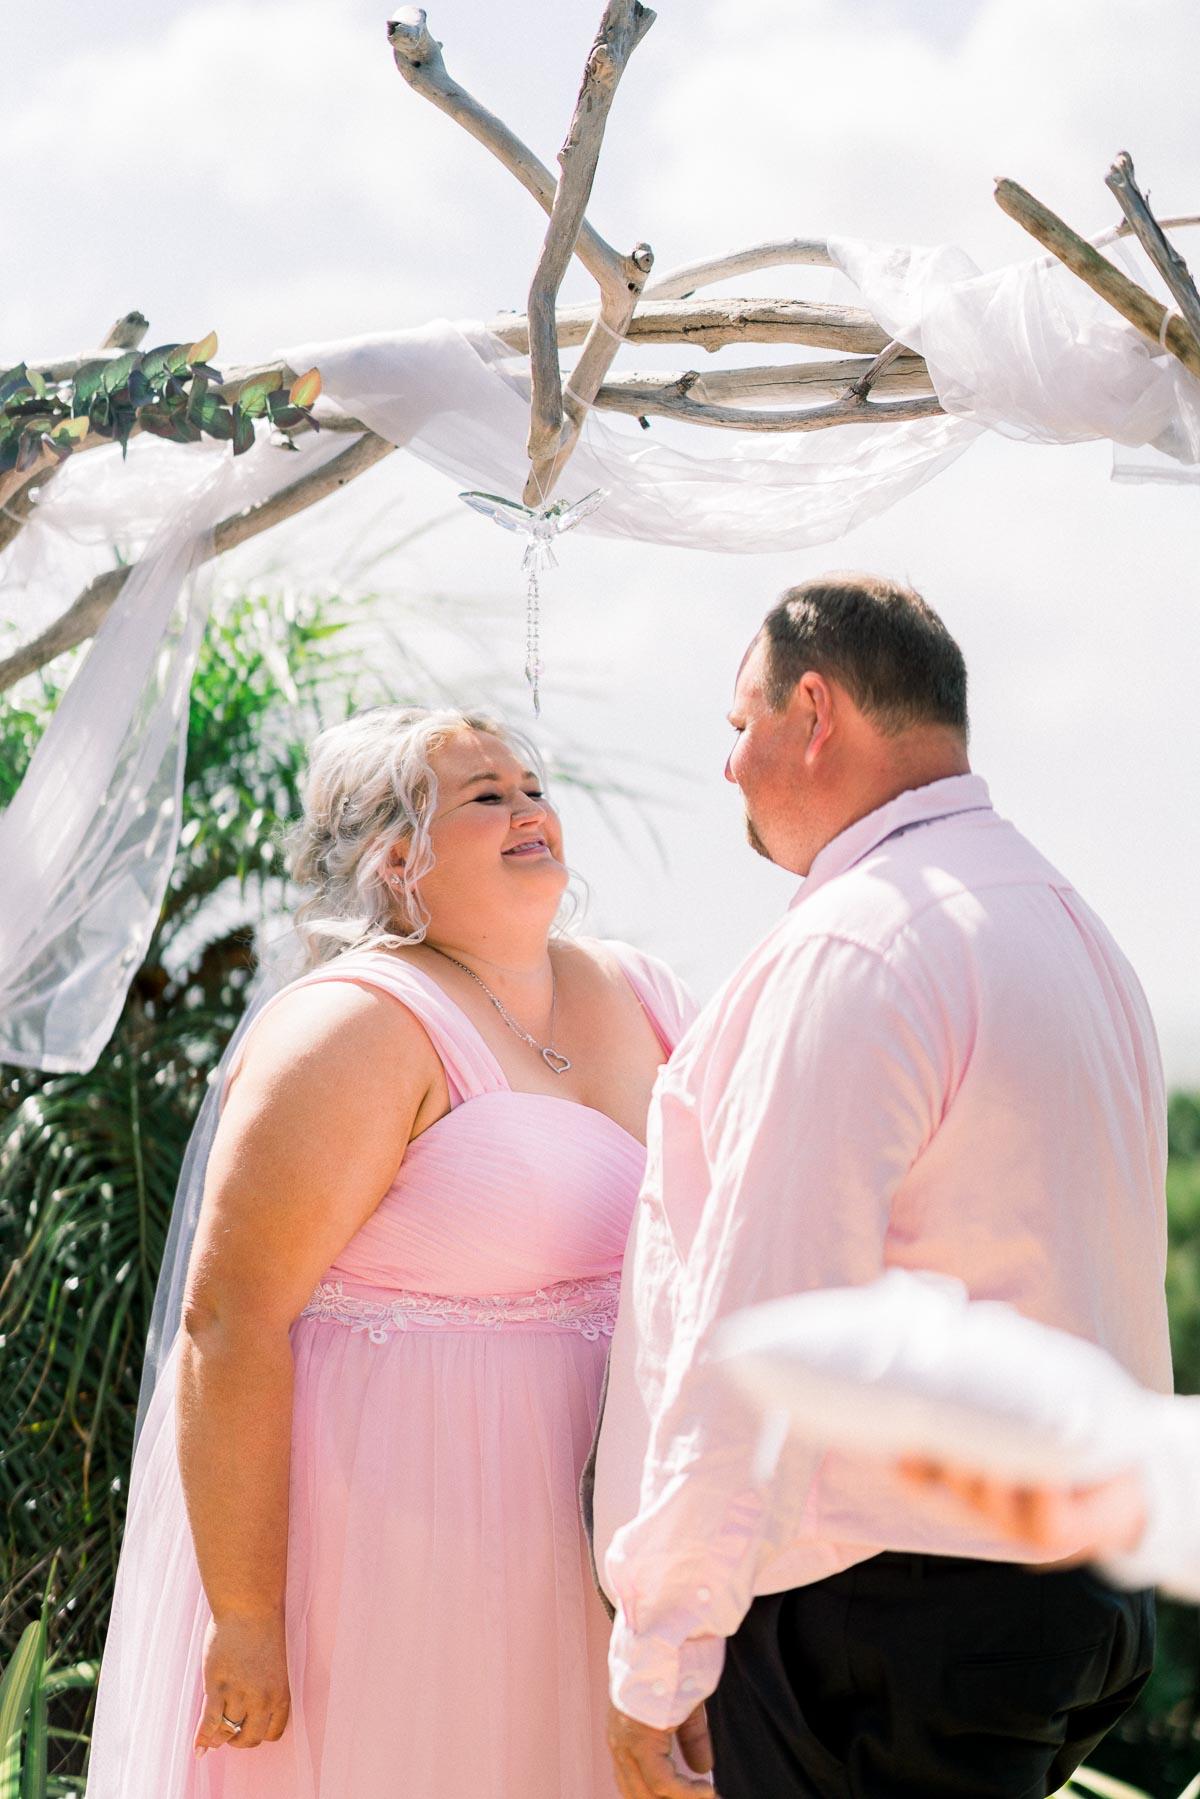 mt-eliza-mornington-peninsula-backyard-wedding-heart+soul-weddings-allison-matt-03244.jpg